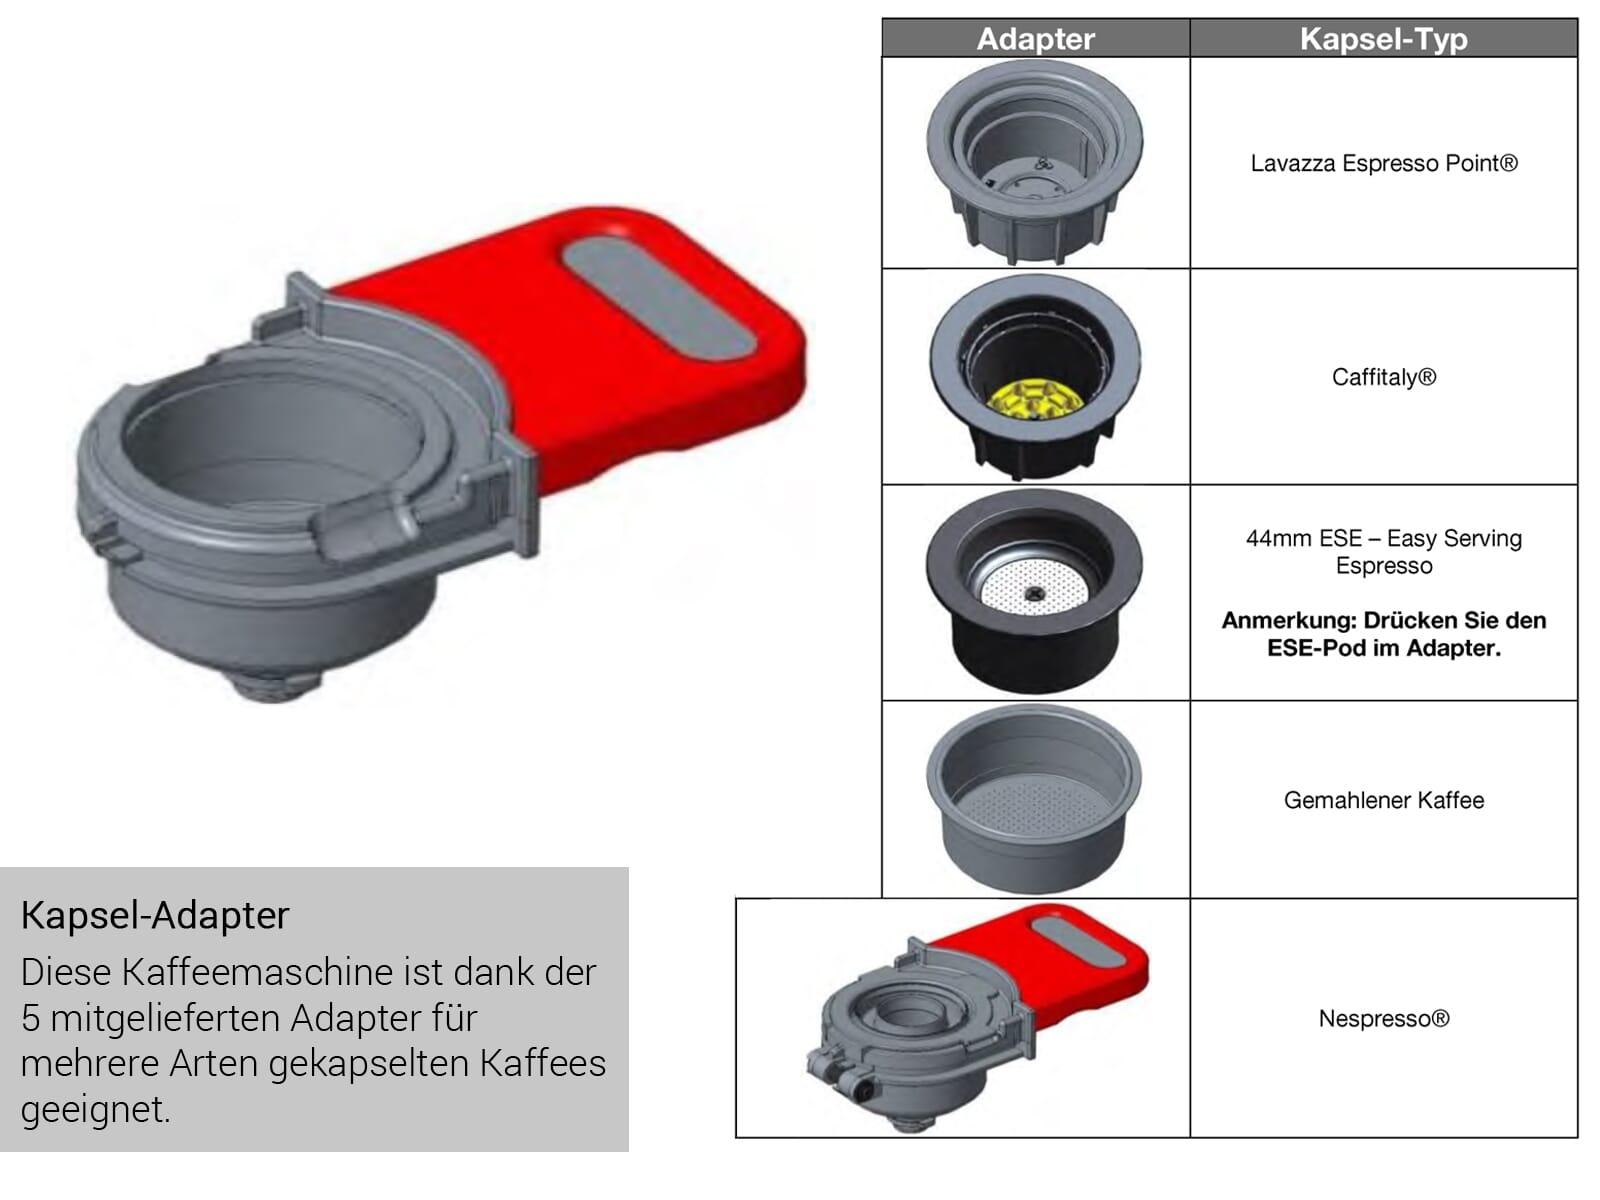 Küppersbusch CKK 6350.0 S5 K-Series.3 Kaffee-Kapselautomat Schwarz/Black Velvet für Nespresso® Kapseln